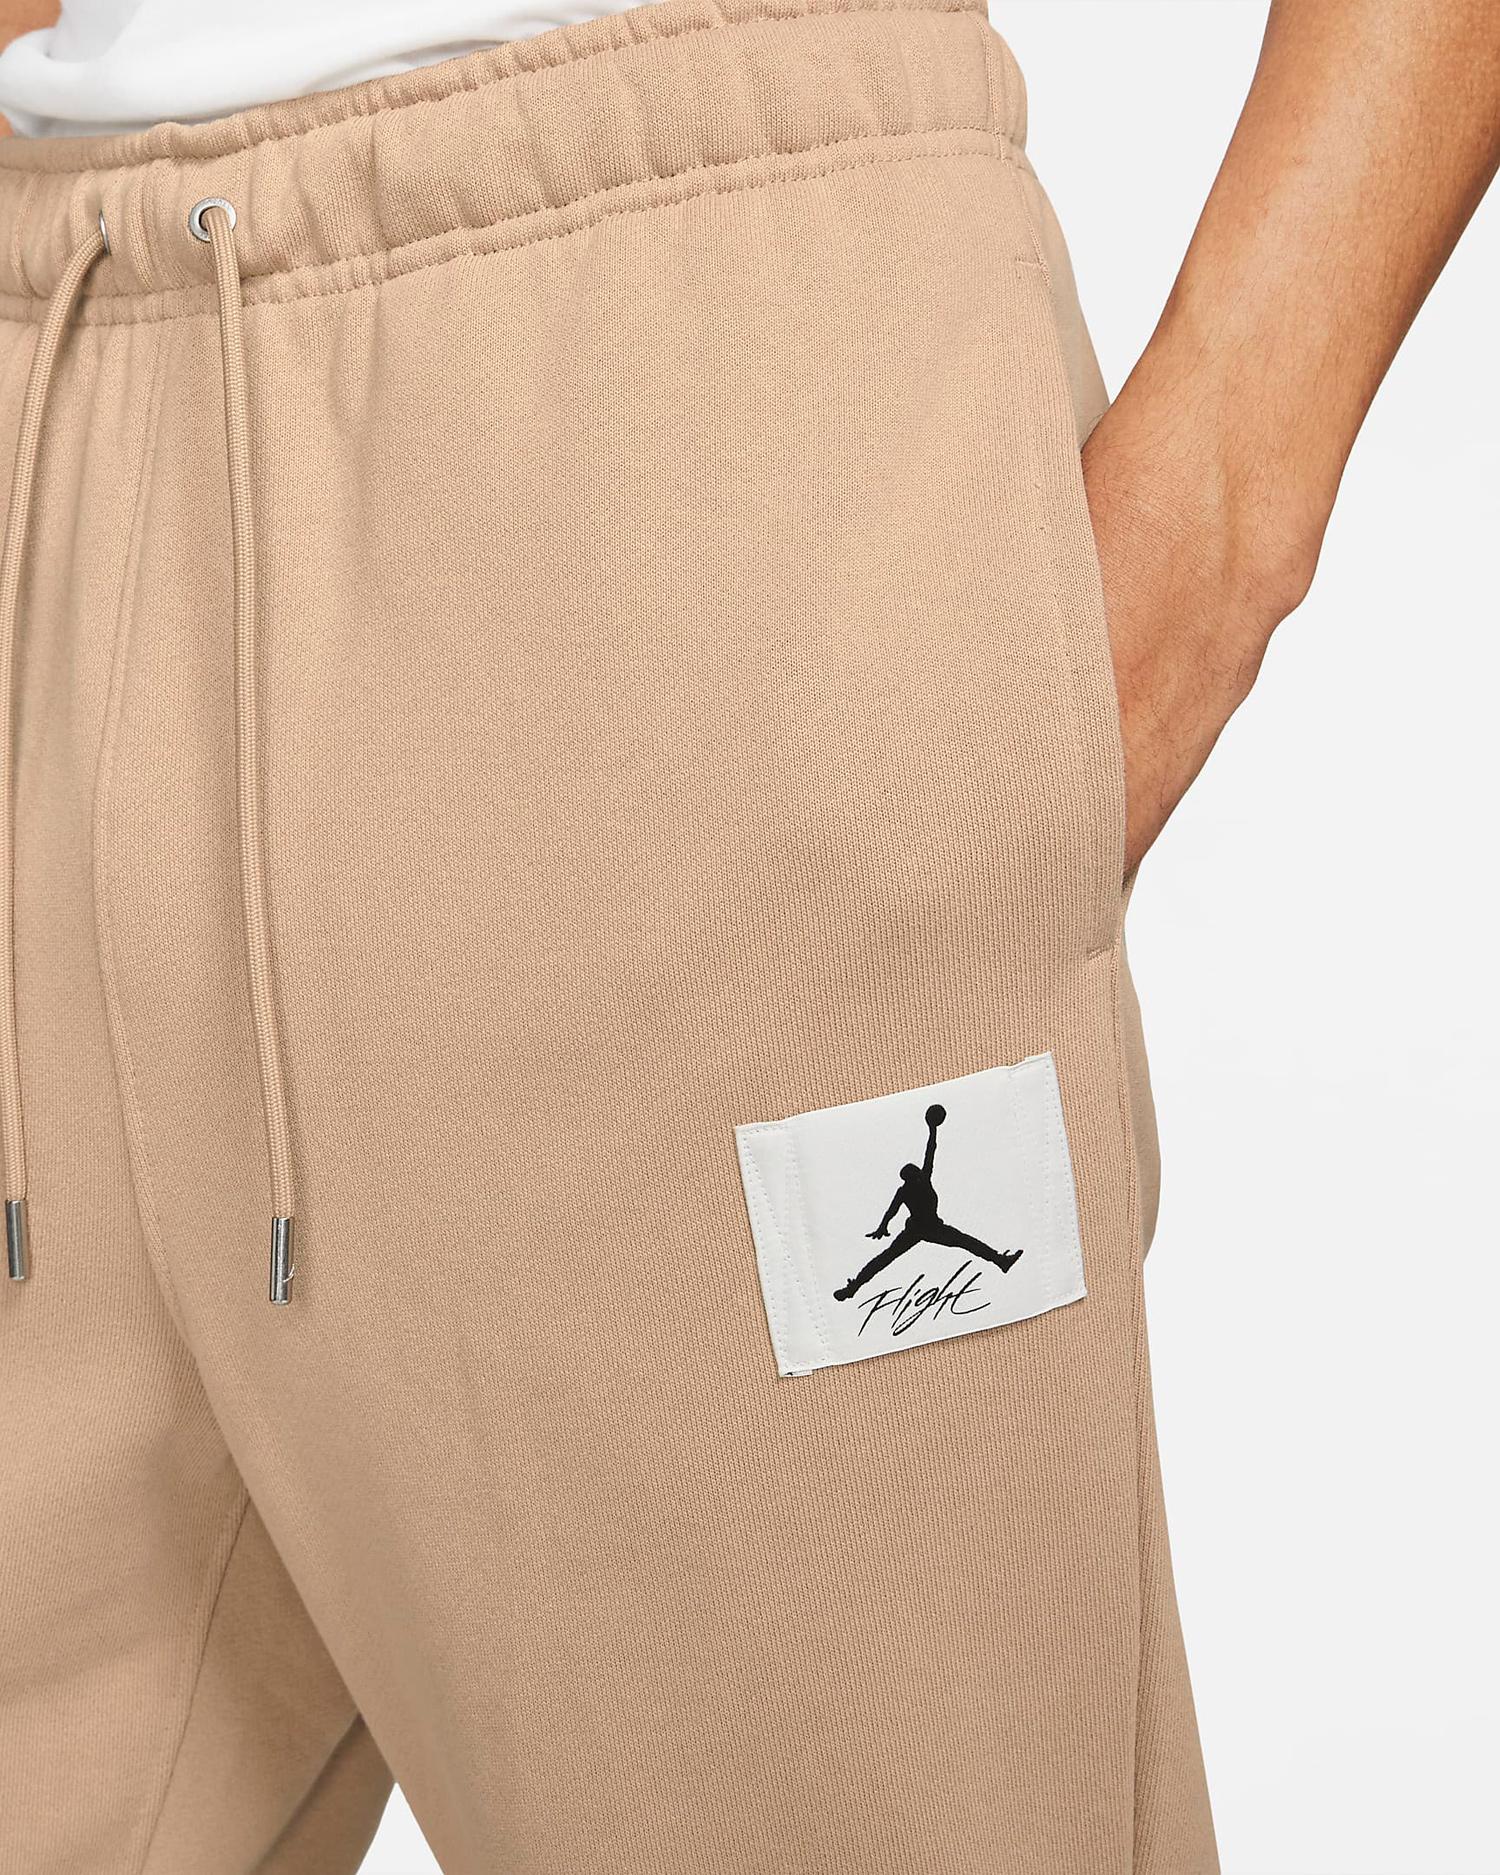 jordan-hemp-essential-flight-fleece-pants-2